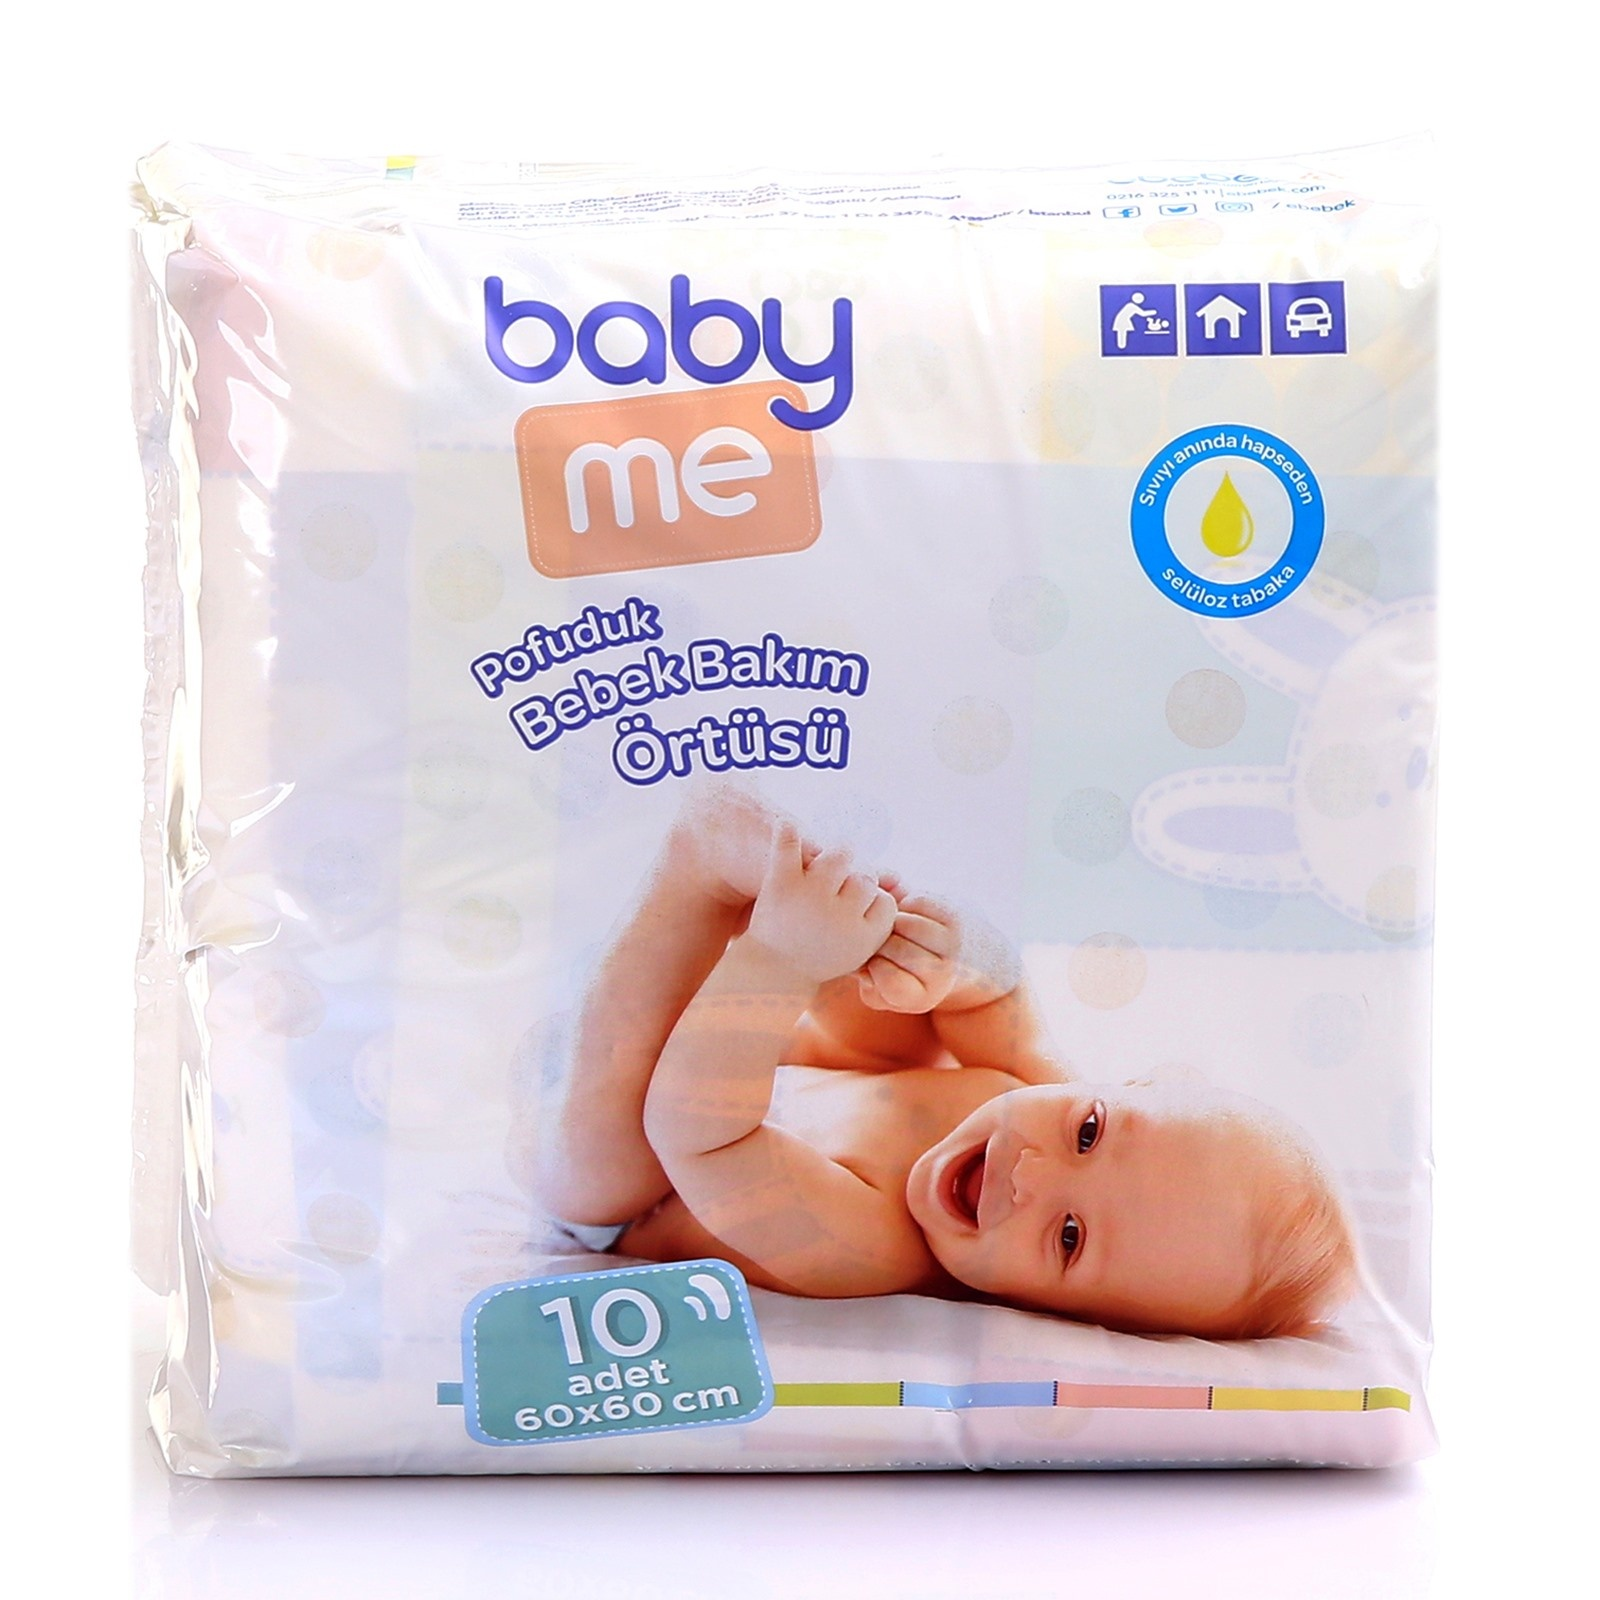 Ebebek Baby&me Diaper Changing Mat 60x60 Cm 10 Pcs